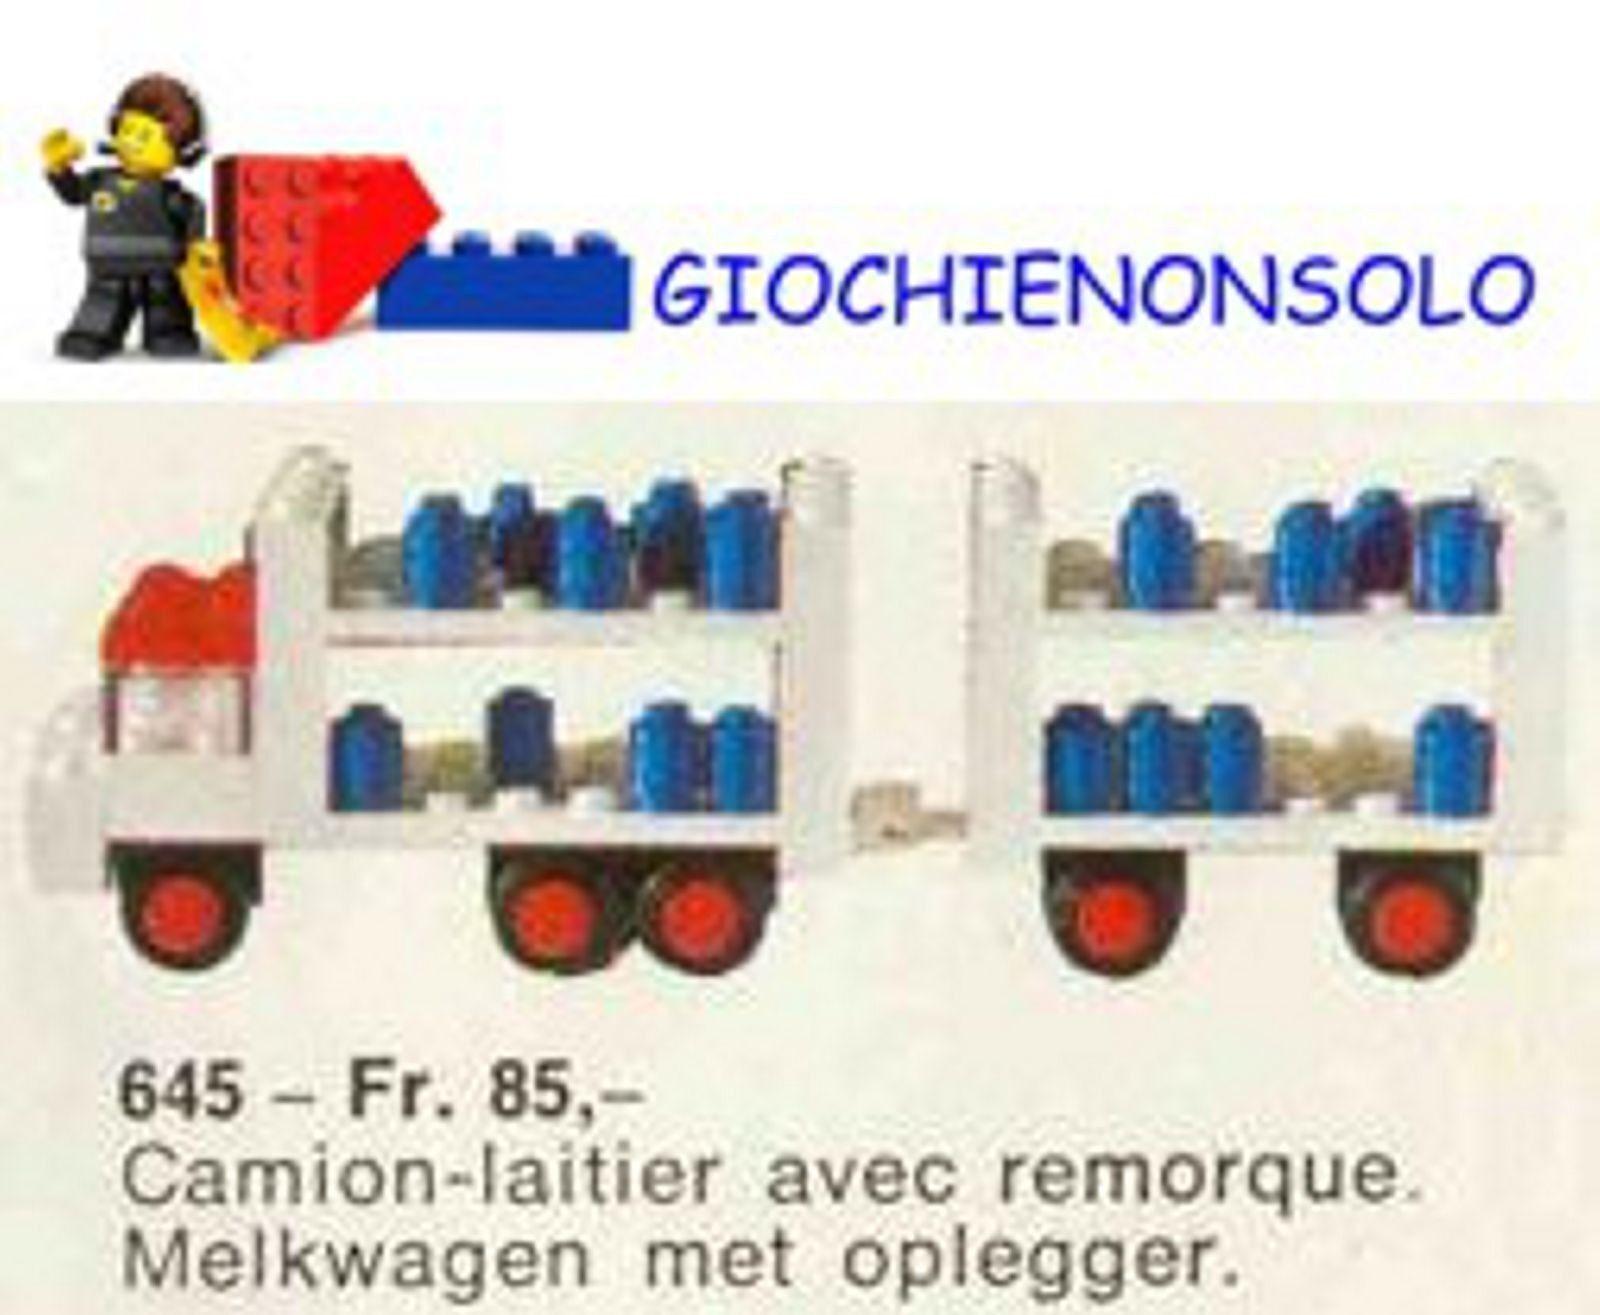 LEGO LEGOLAND 645 - MILK FLOAT & TRAILER